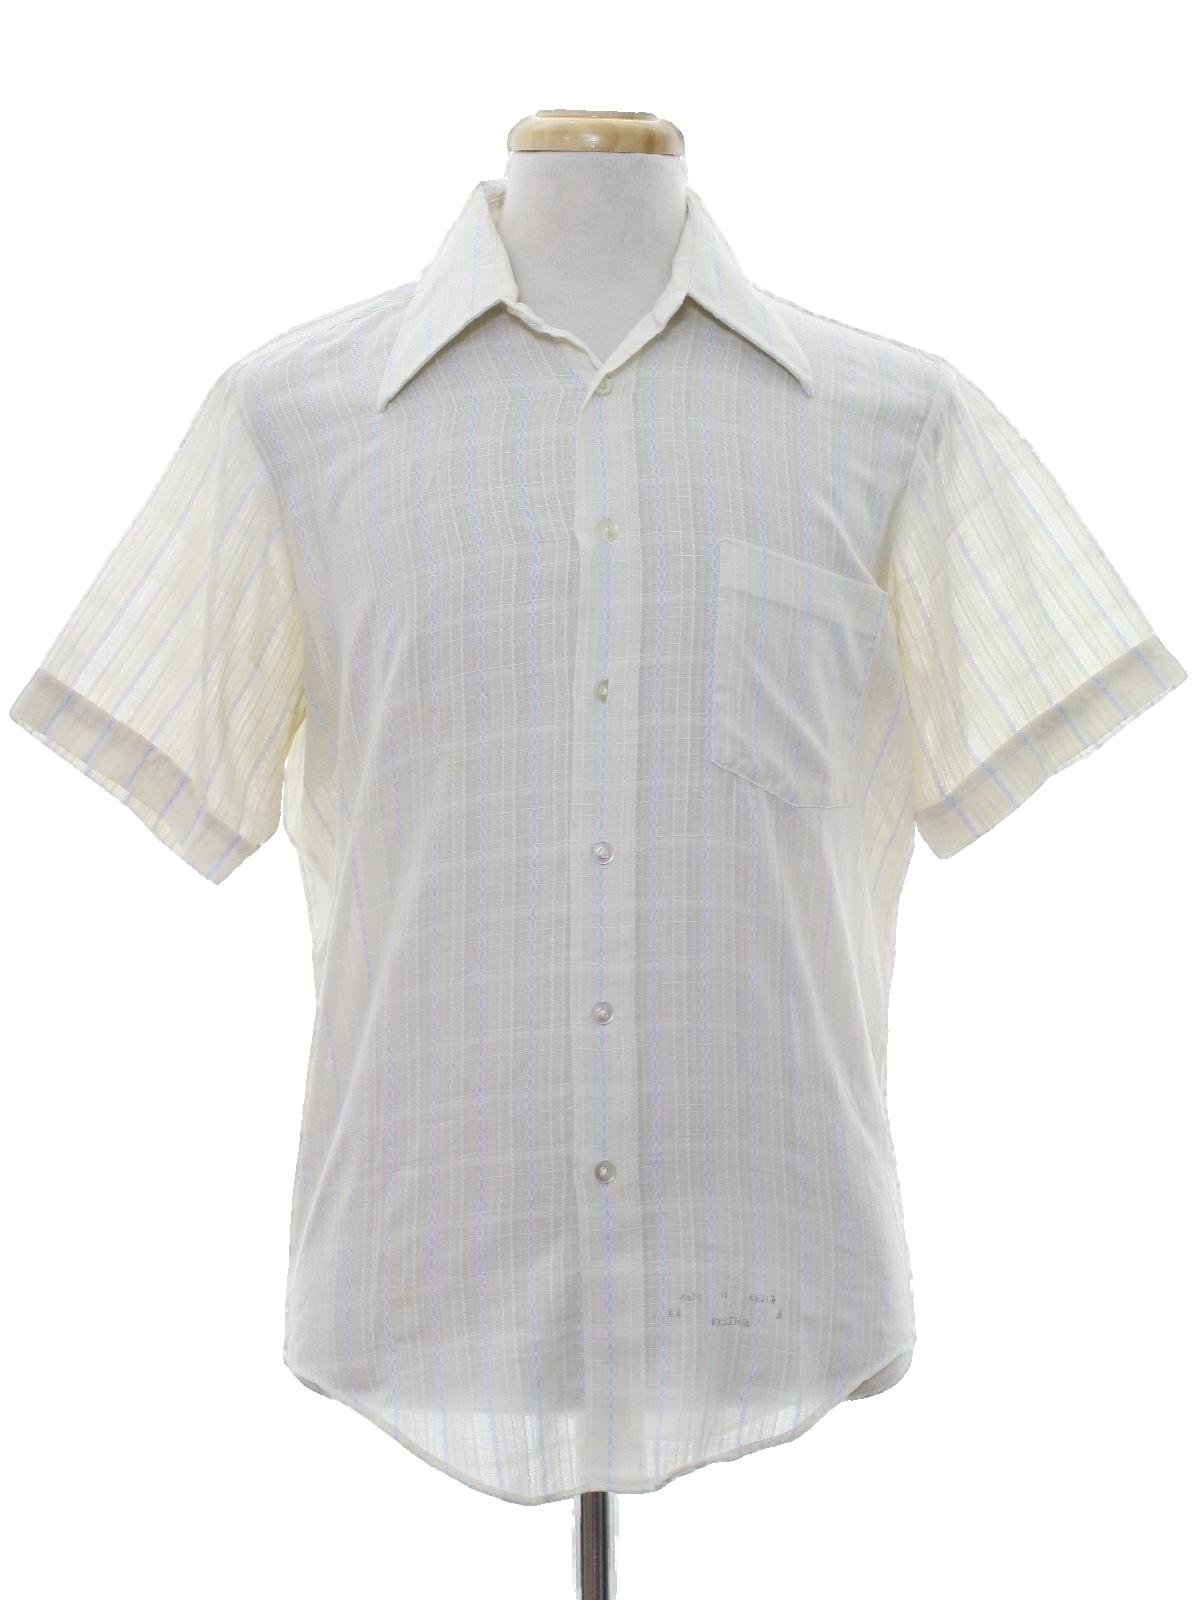 Retro 1970 39 s shirt kmart 70s kmart mens slightly for Kmart button up shirts